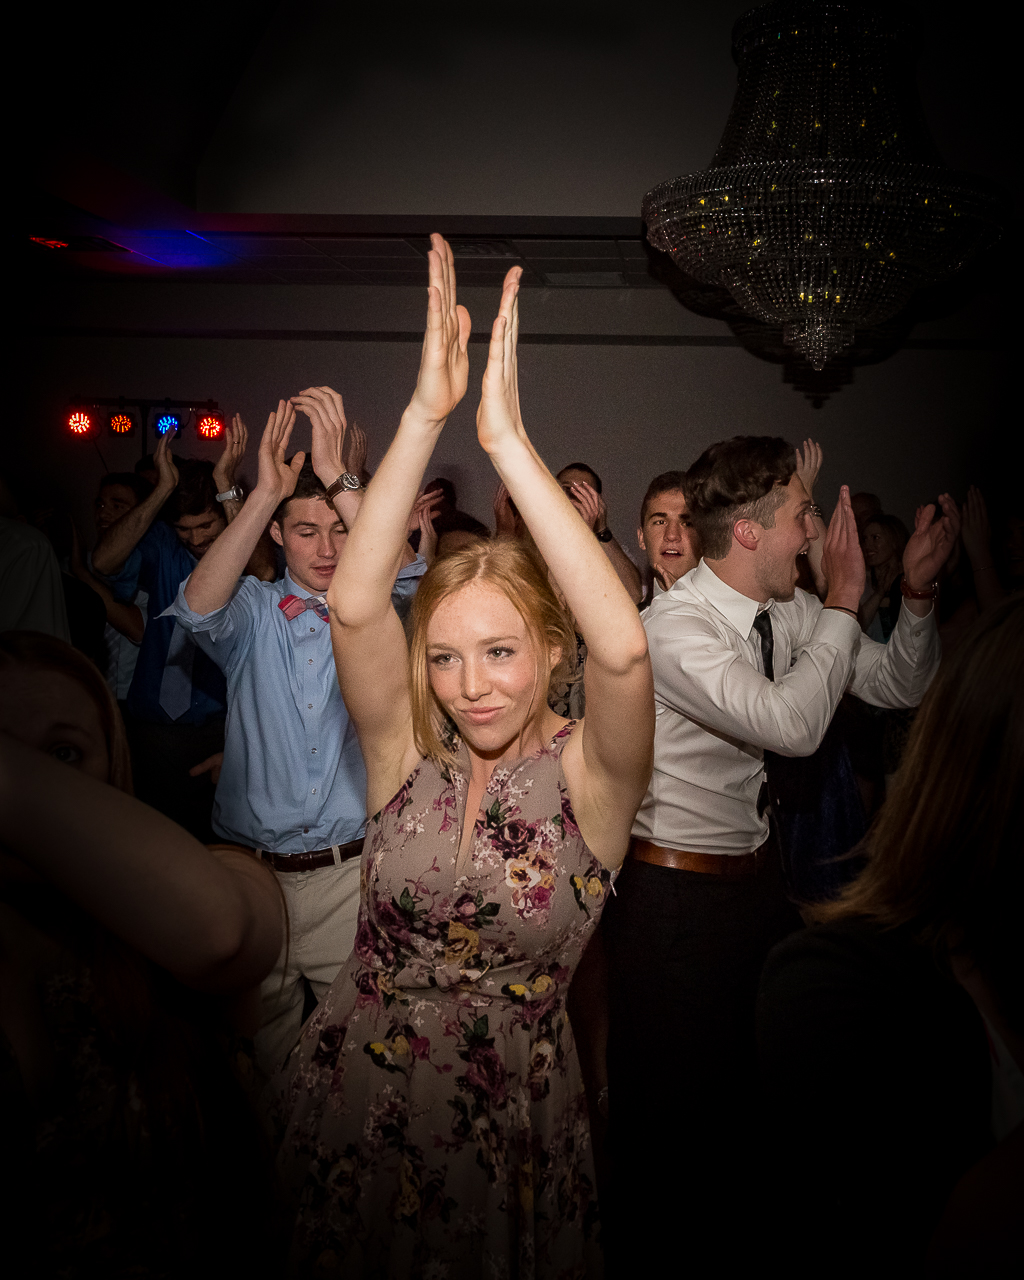 clytie-sadler-photography-wedding-reception-dancing-035a.jpg